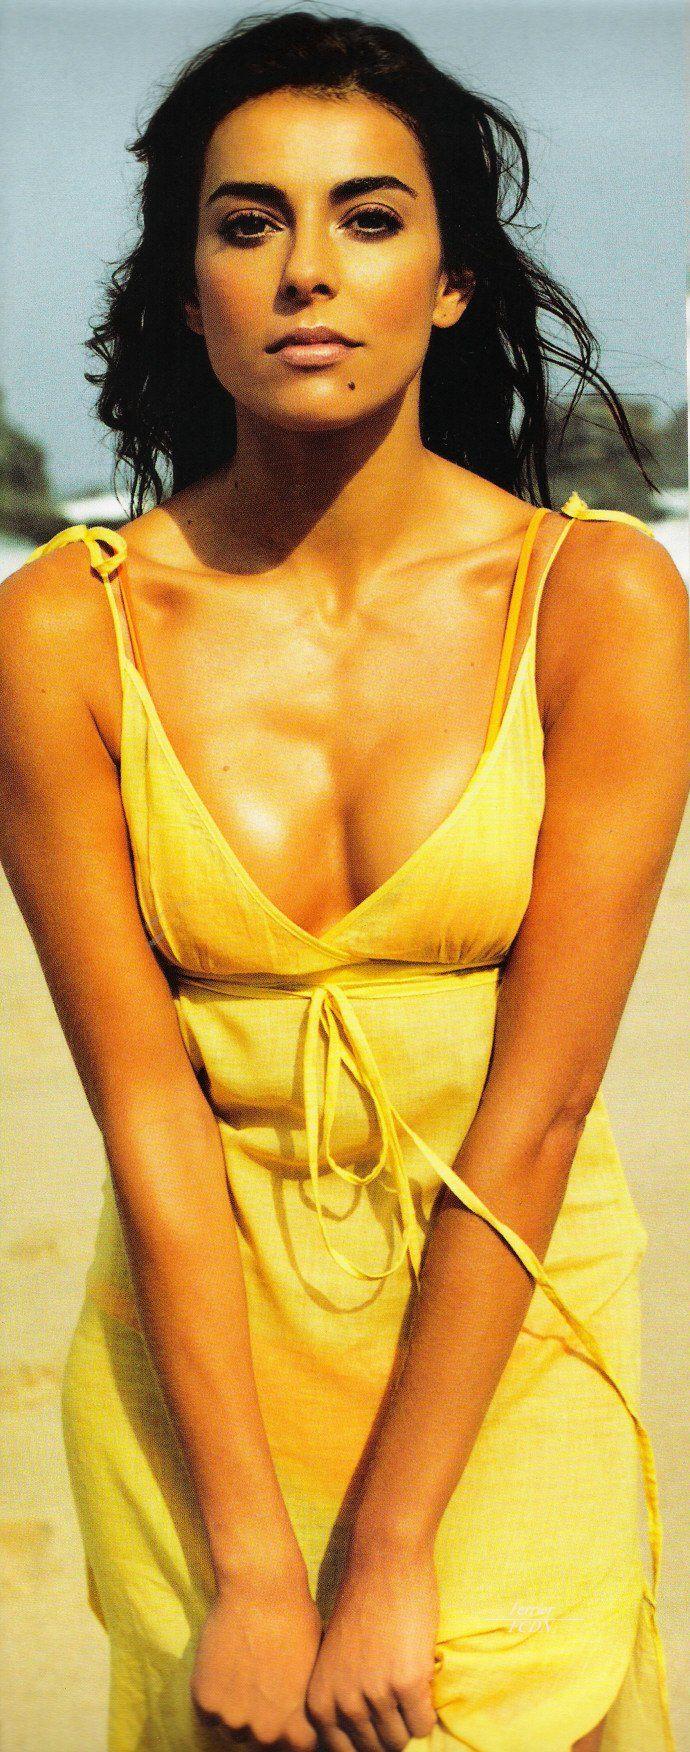 beautiful portuguese girl nude